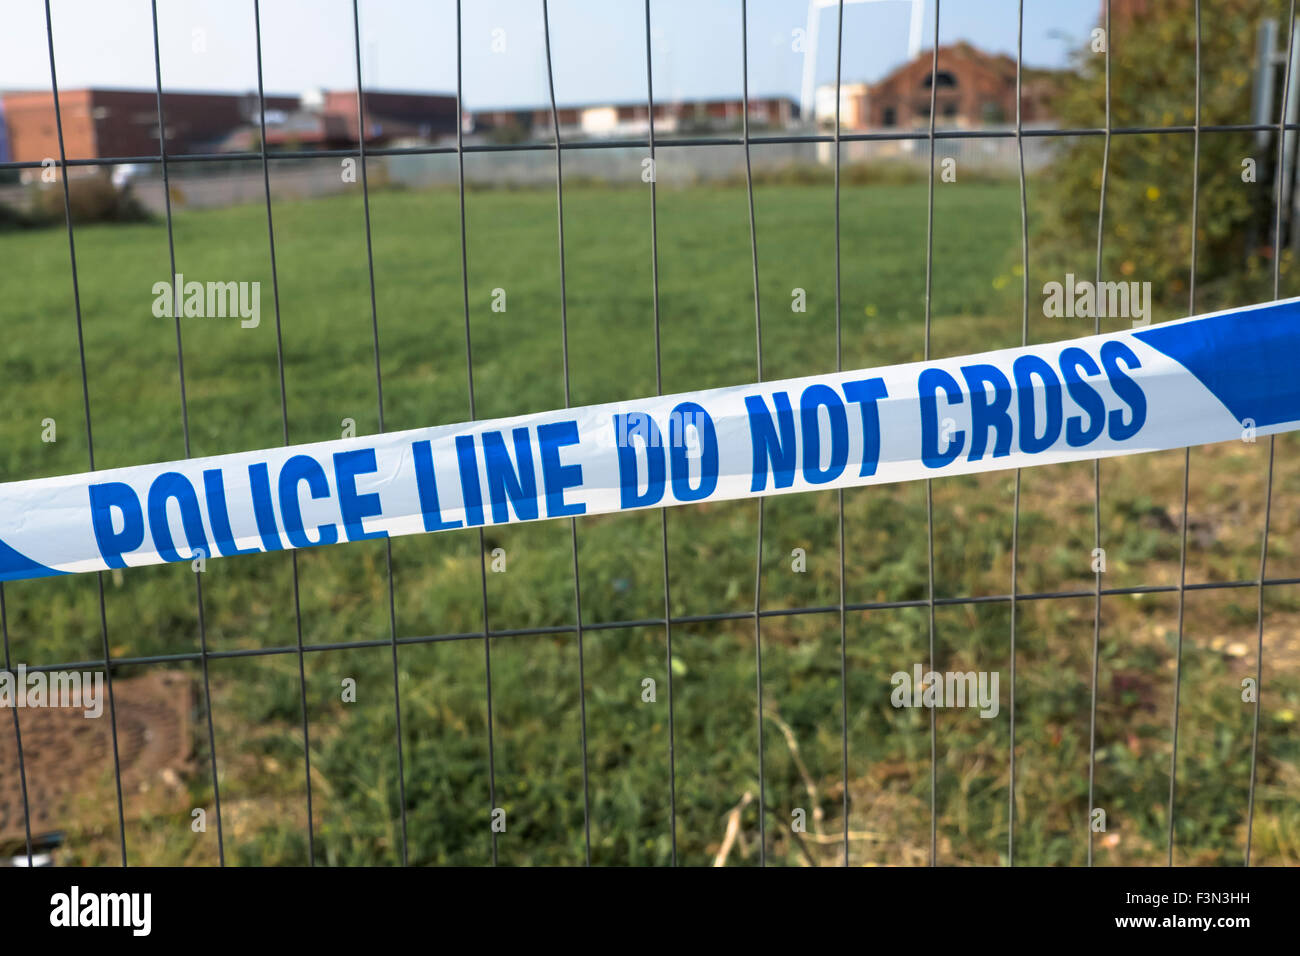 Police Line do not cross tape - Stock Image